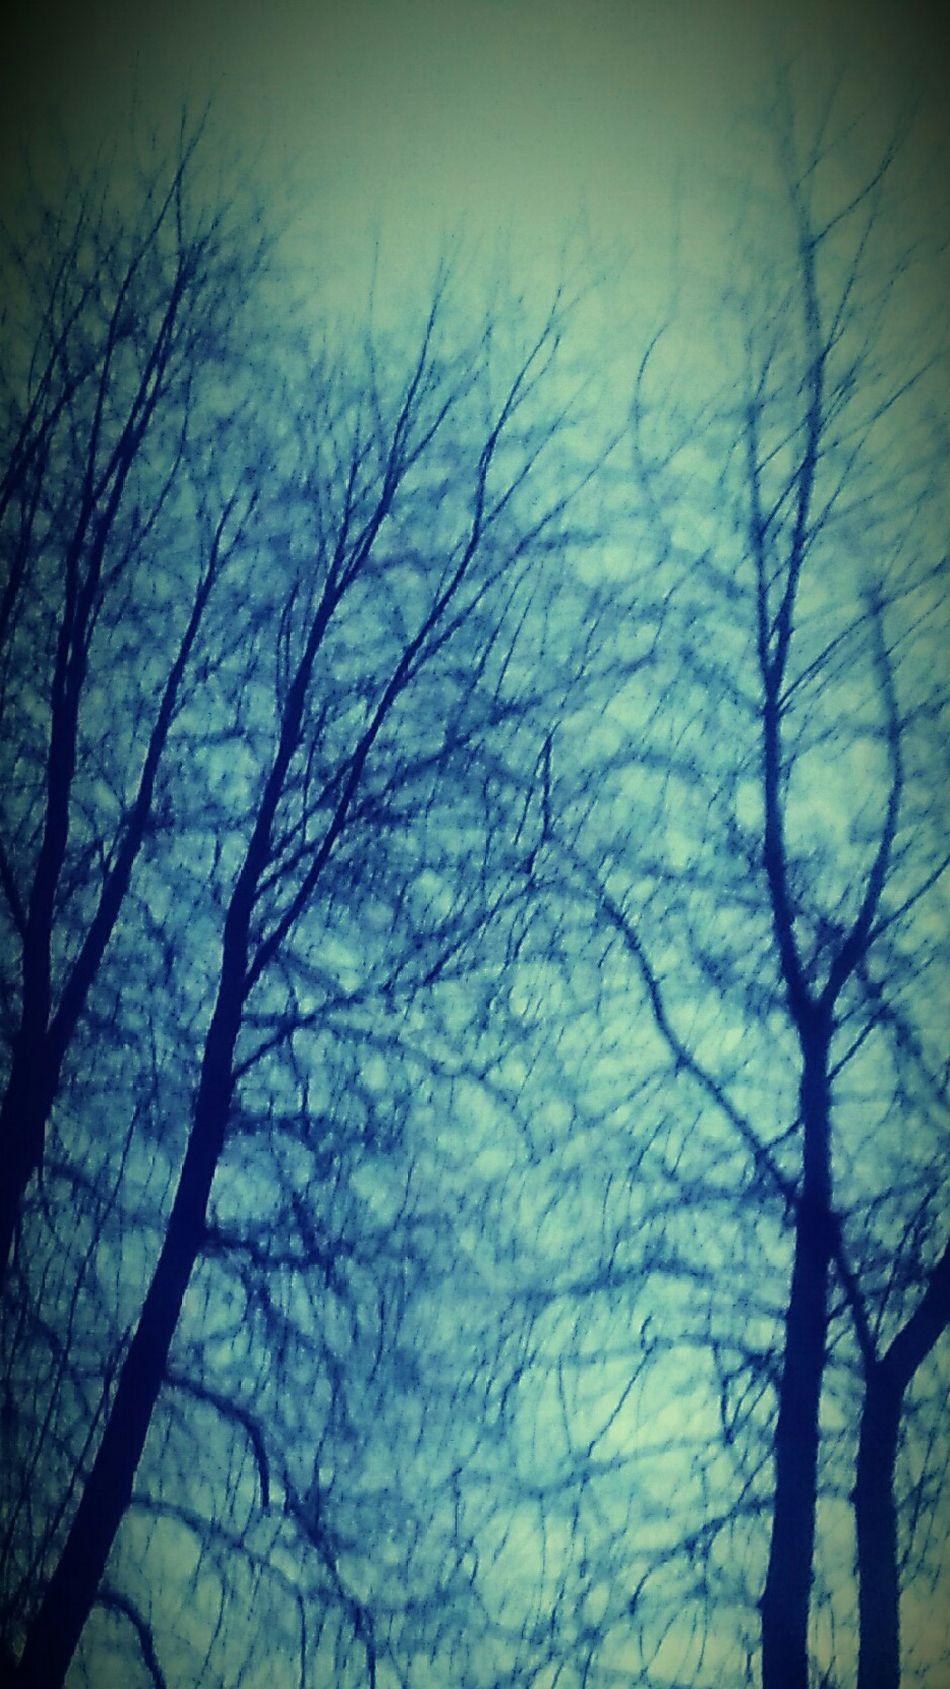 Natures Textures Dream Catchers Treesilhouette Trees Dreamcatchers Trees Dream Catchers Nature's Dreamcatcher